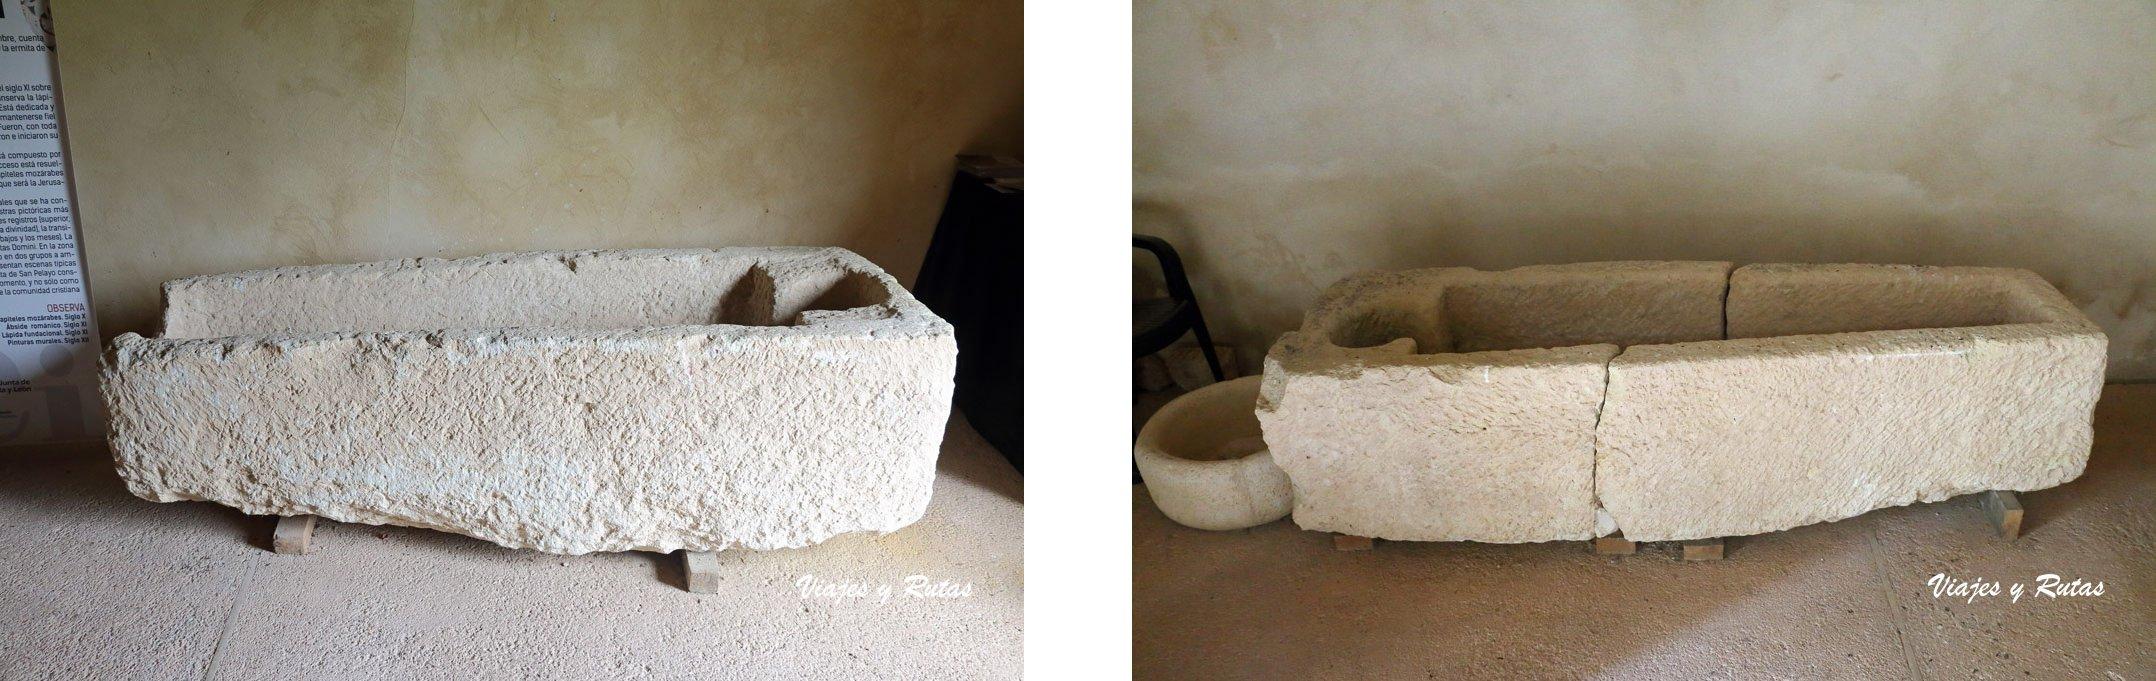 Sarcófagos de San Pelayo, Perazancas de Ojeda